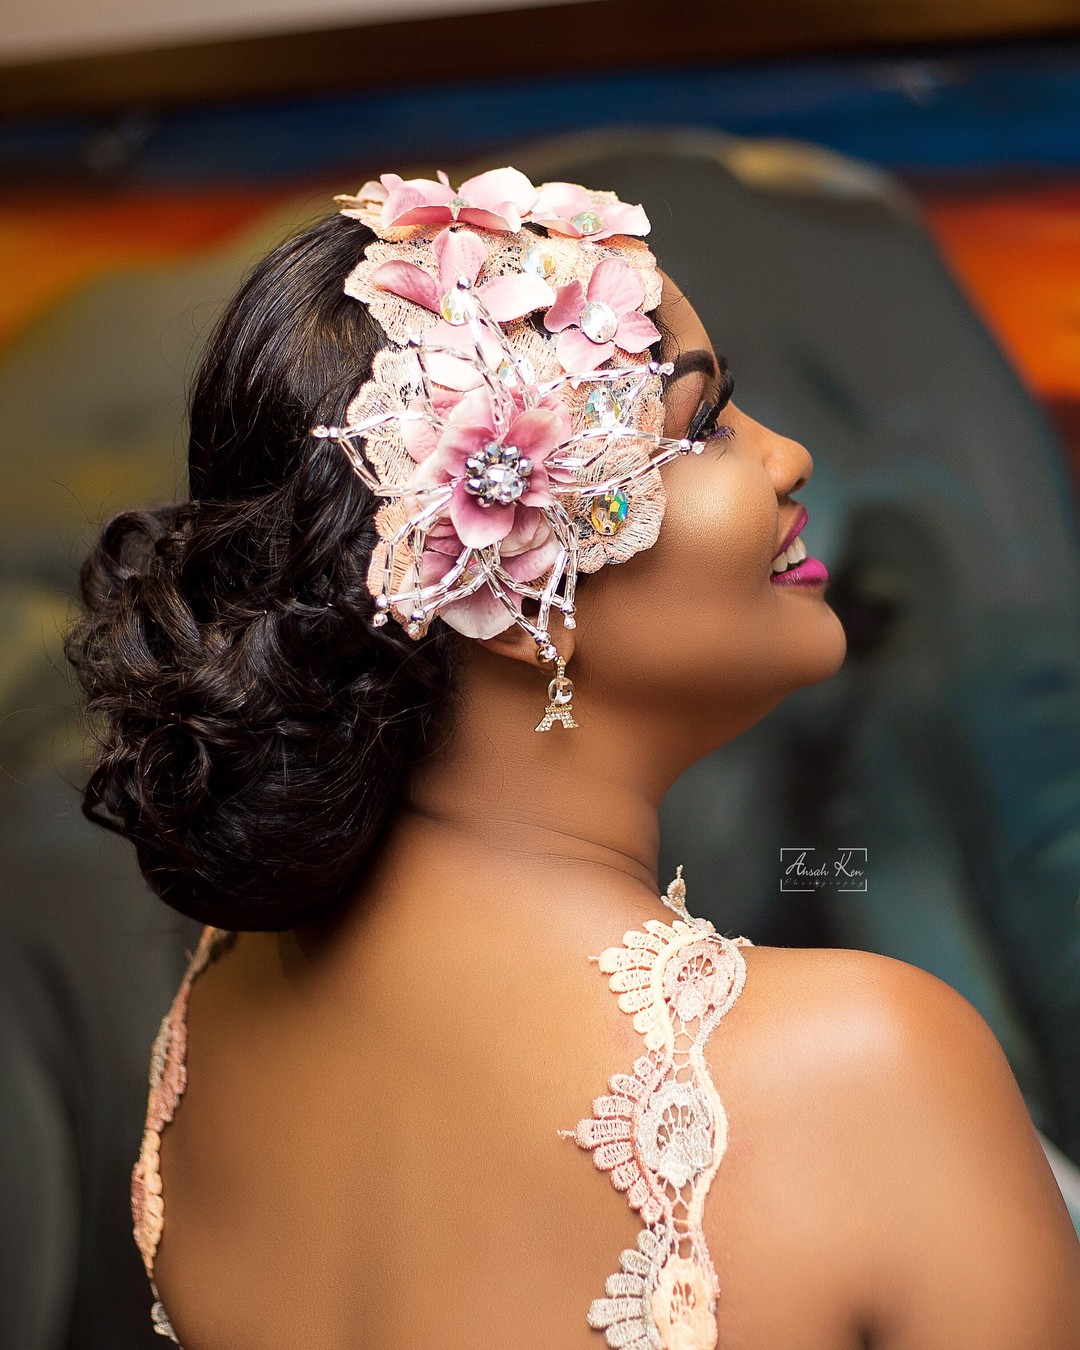 Nana Ama McBrown Wows In Glamorous New Photoshoot (4)